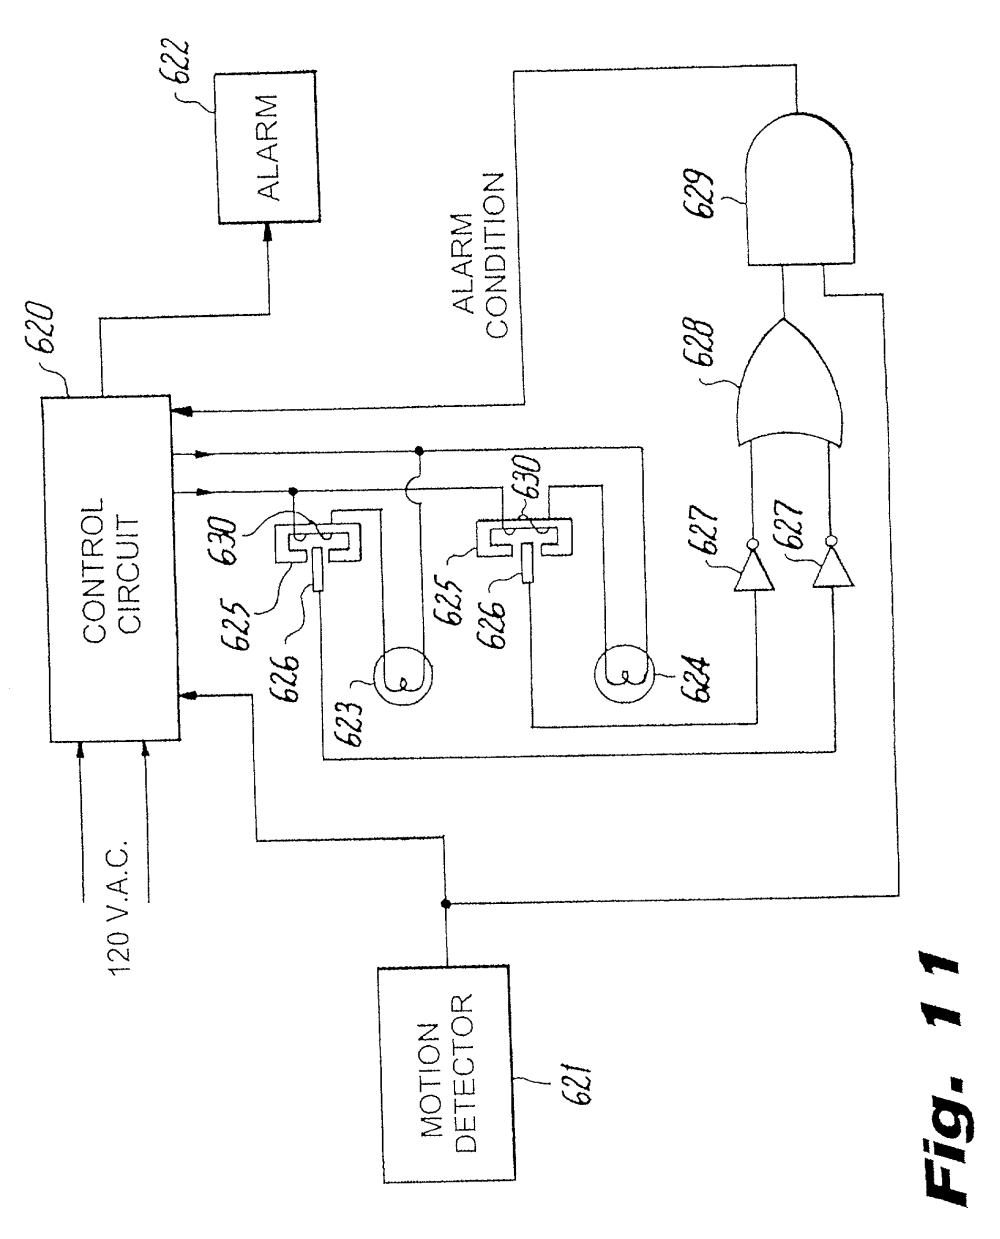 medium resolution of installing a remote motion detector for lighting the photo sensor wiring diagram heath zenith motion sensor